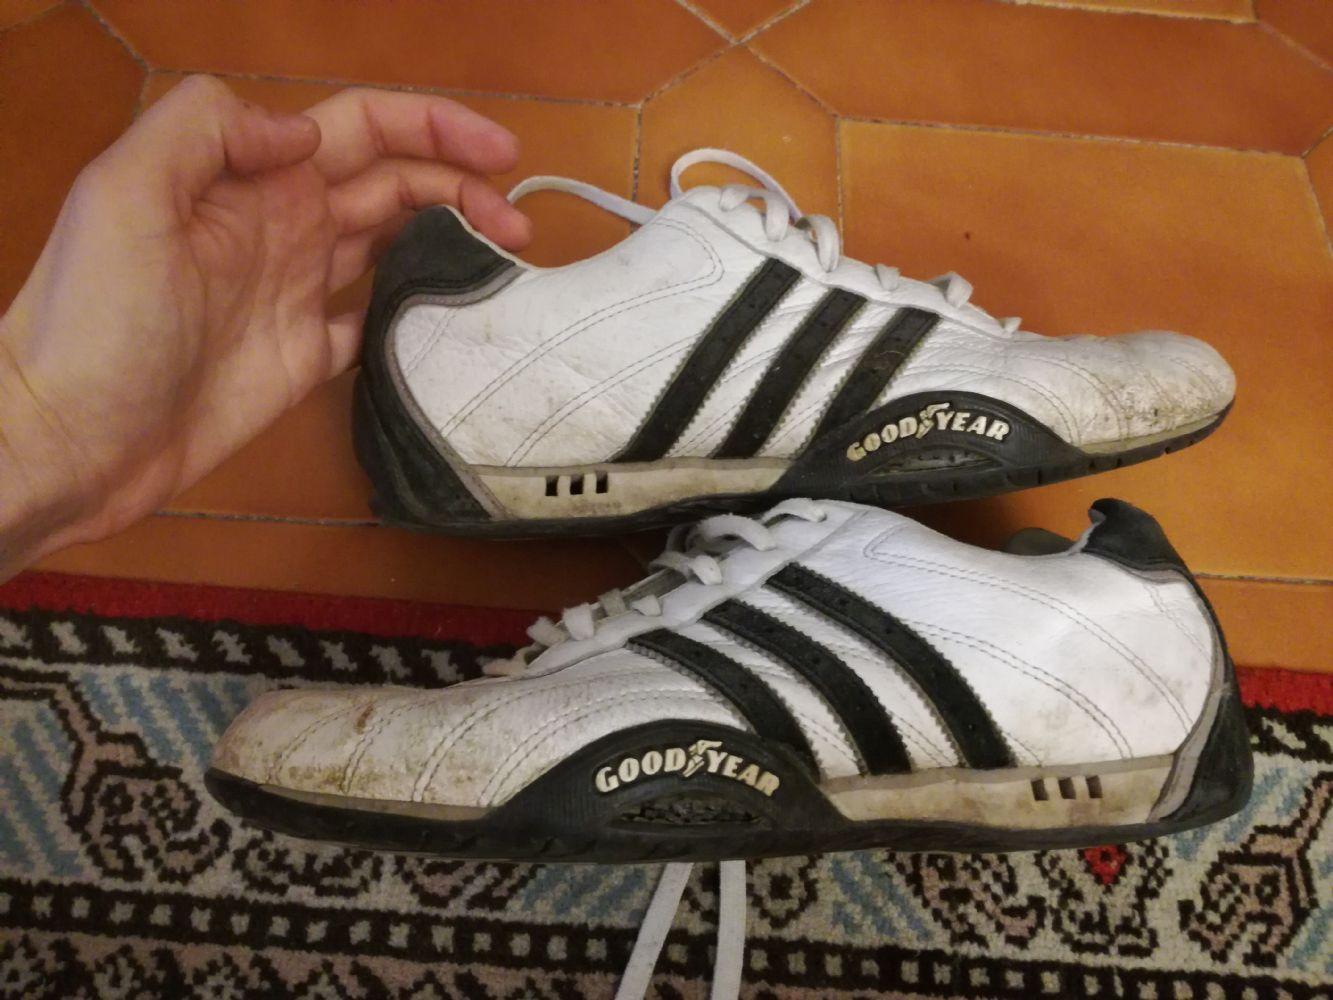 scarpe da ginnastica adidas goodyar